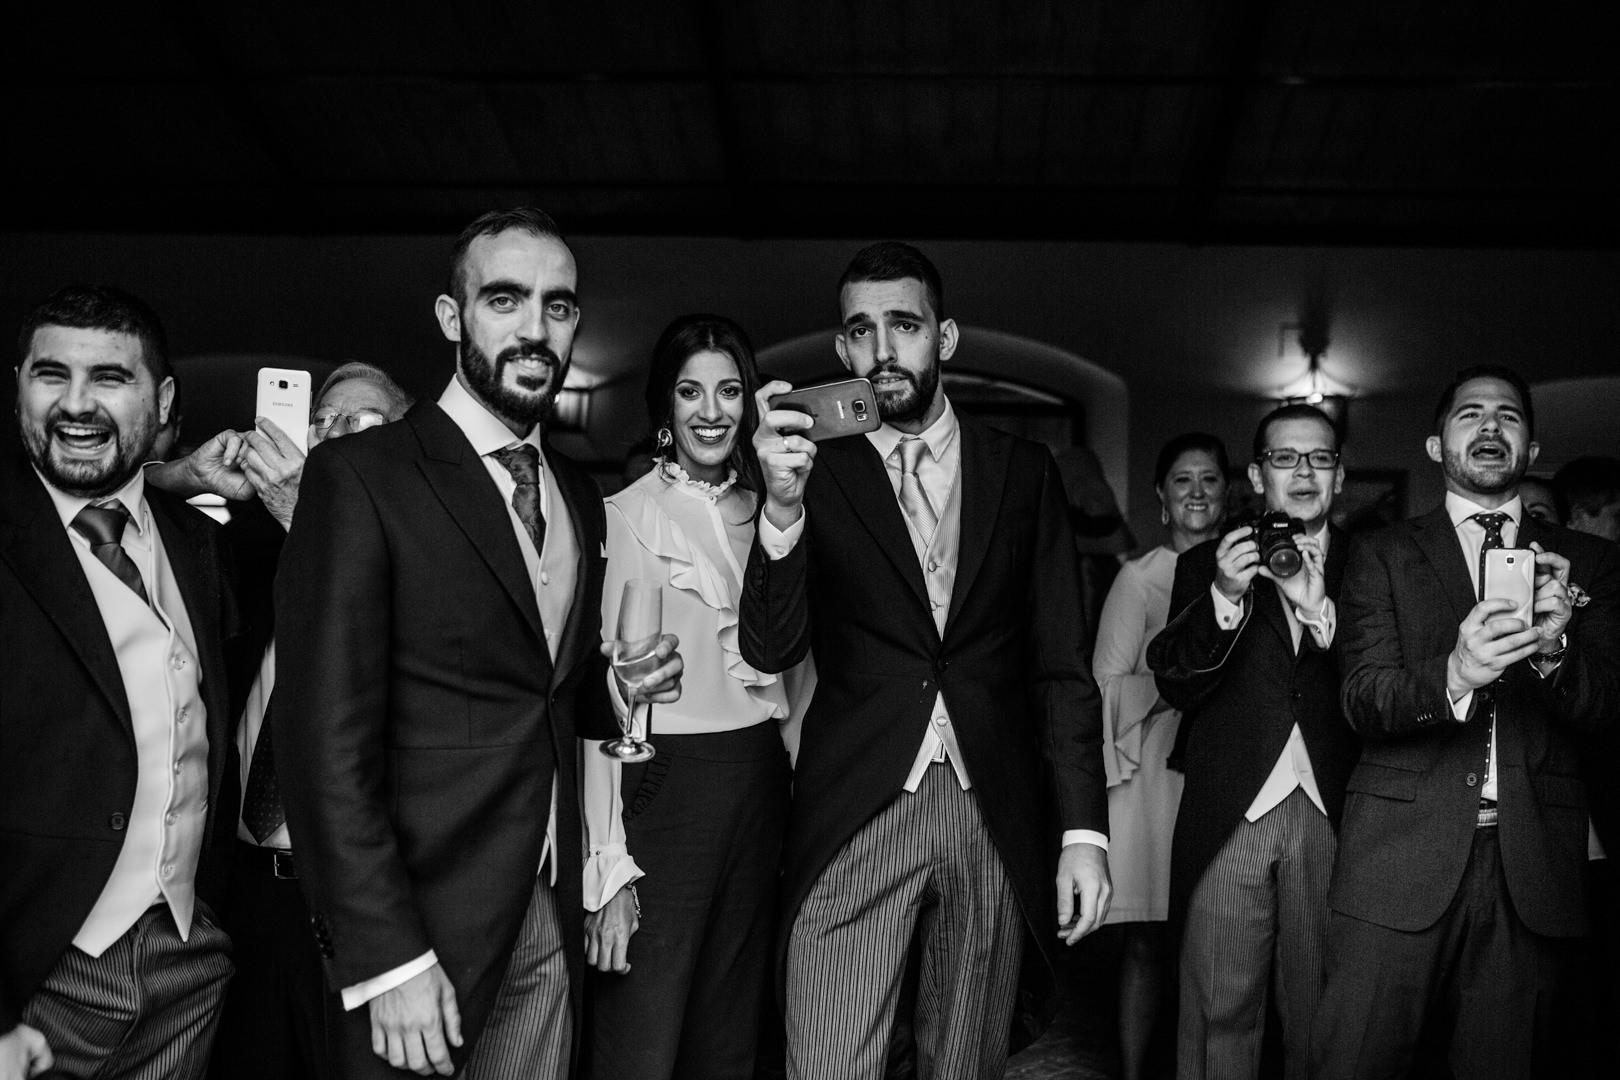 Boda-sevilla-Wedding-engagement-Rafael-Torres-fotografo-bodas-sevilla-madrid-barcelona-wedding-photographer--50.jpg